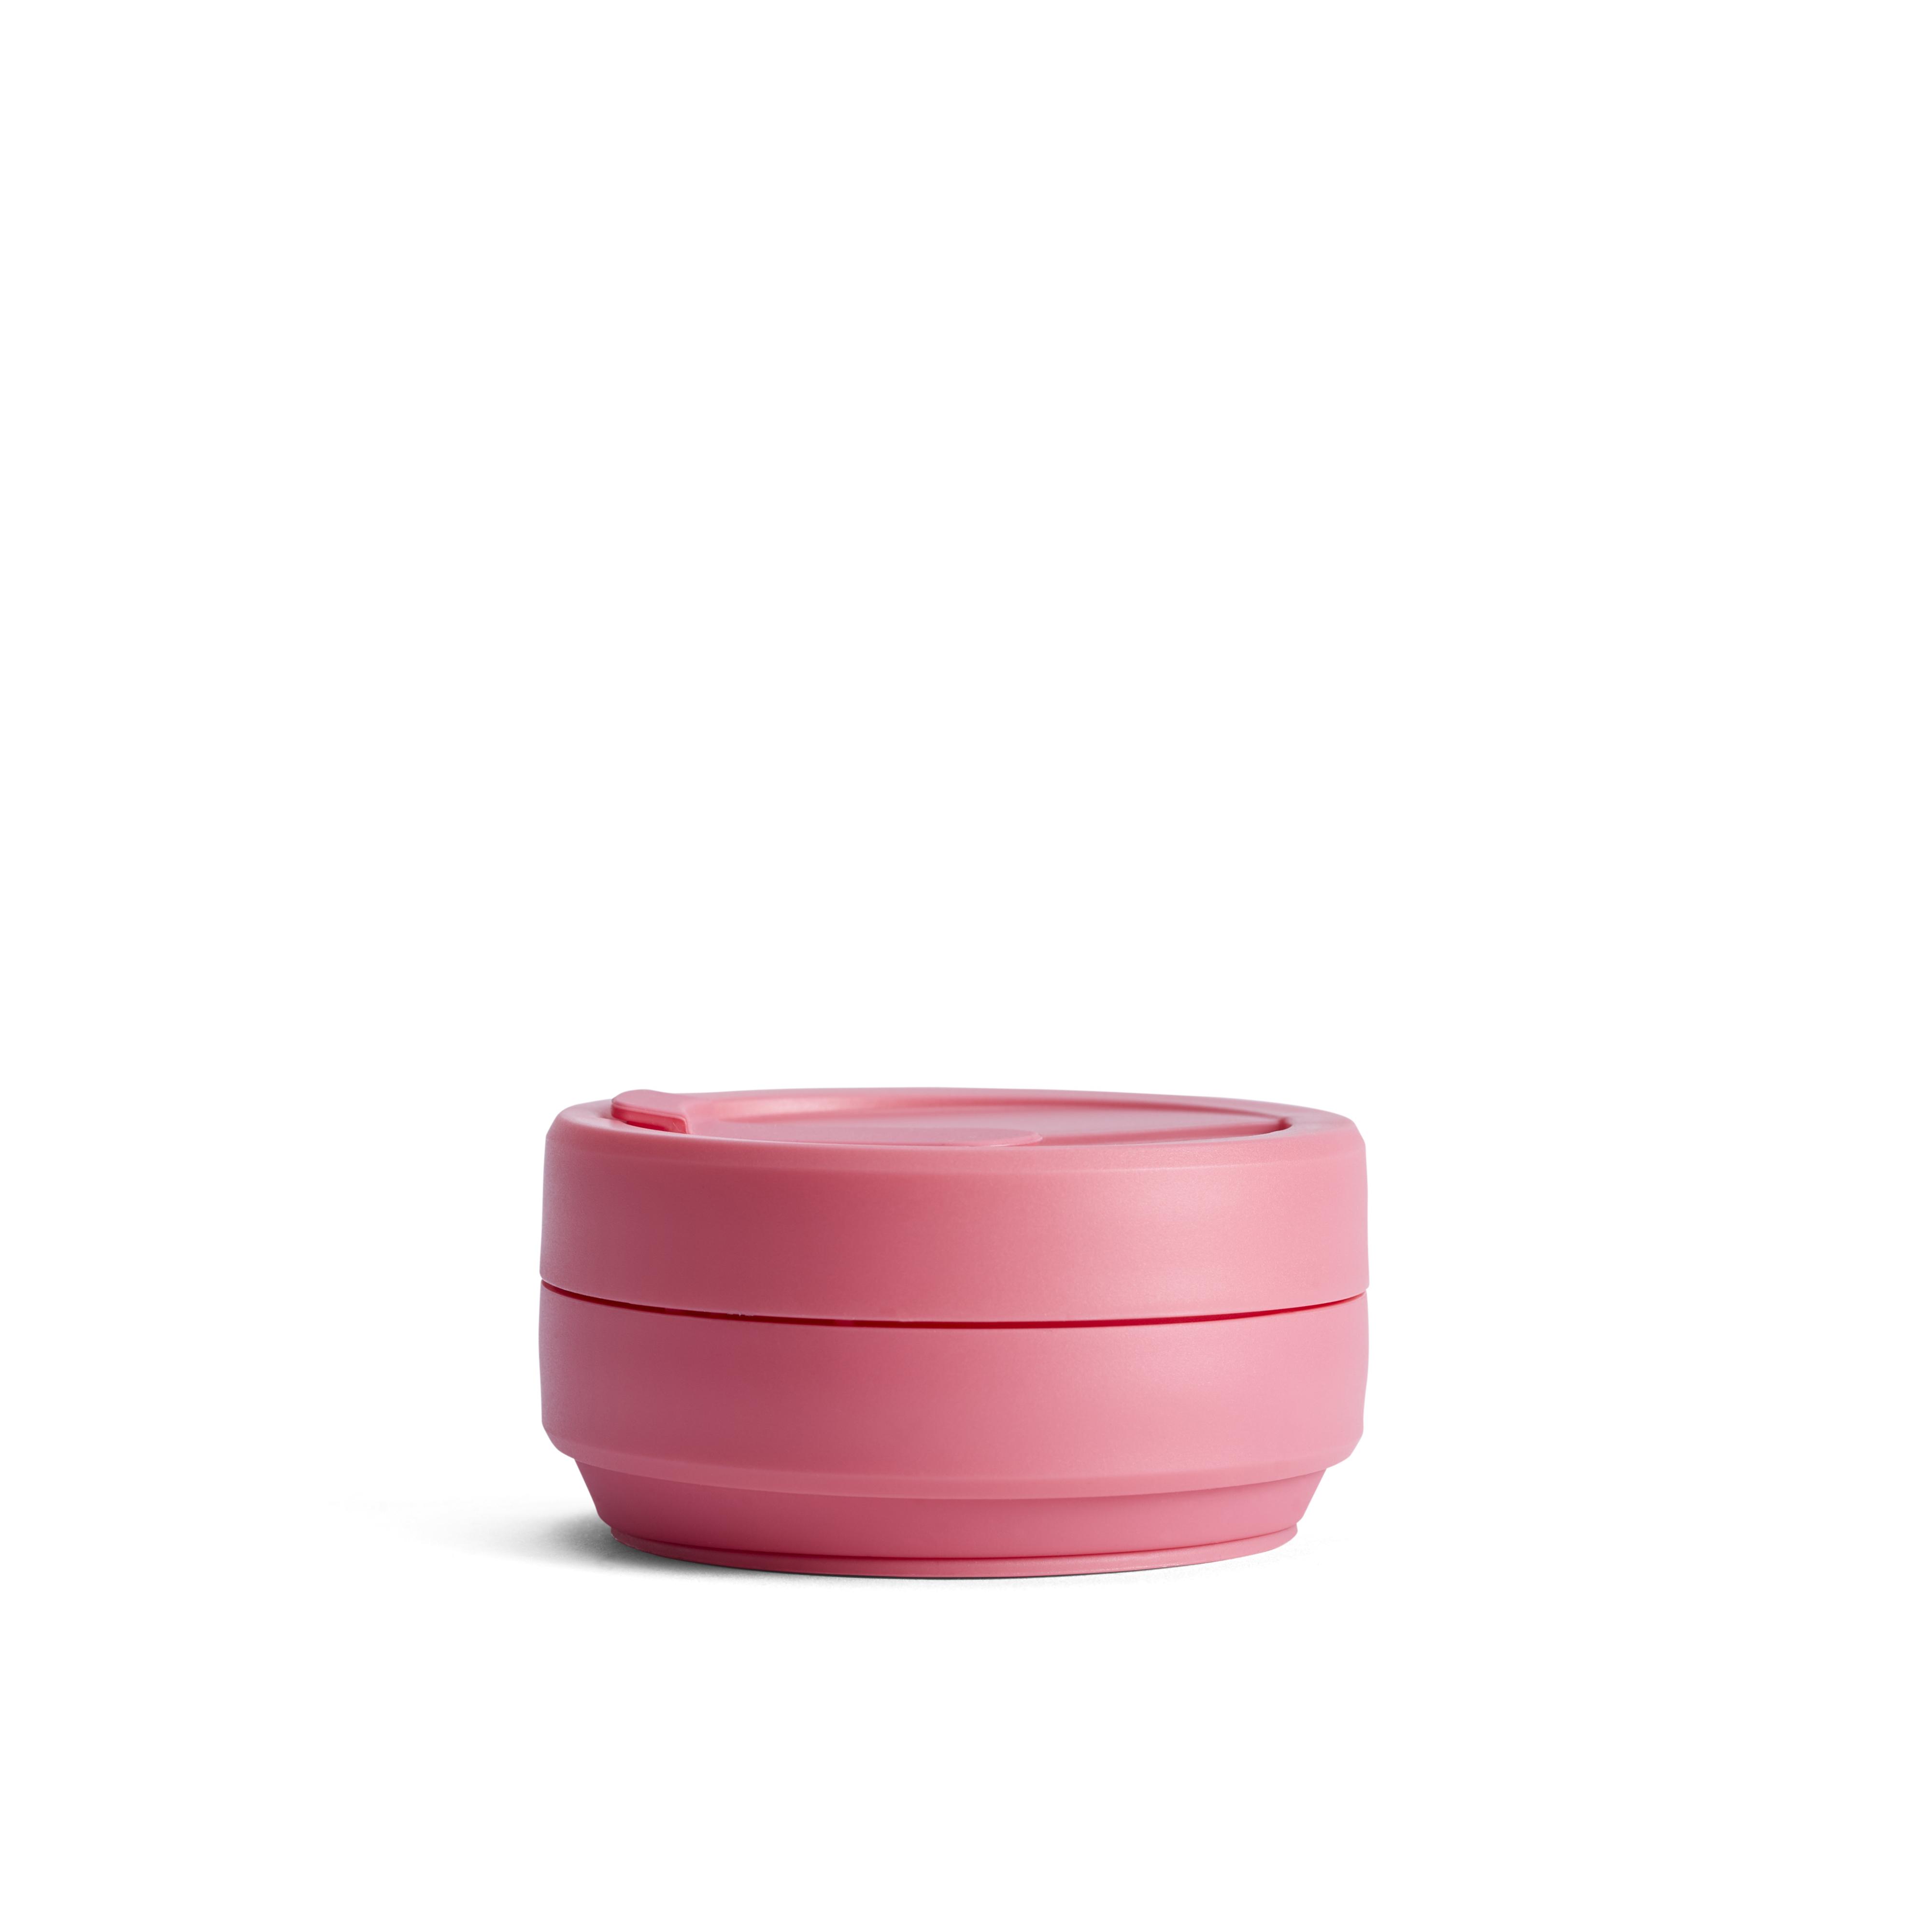 biggie 16 oz cup - peony $19.99